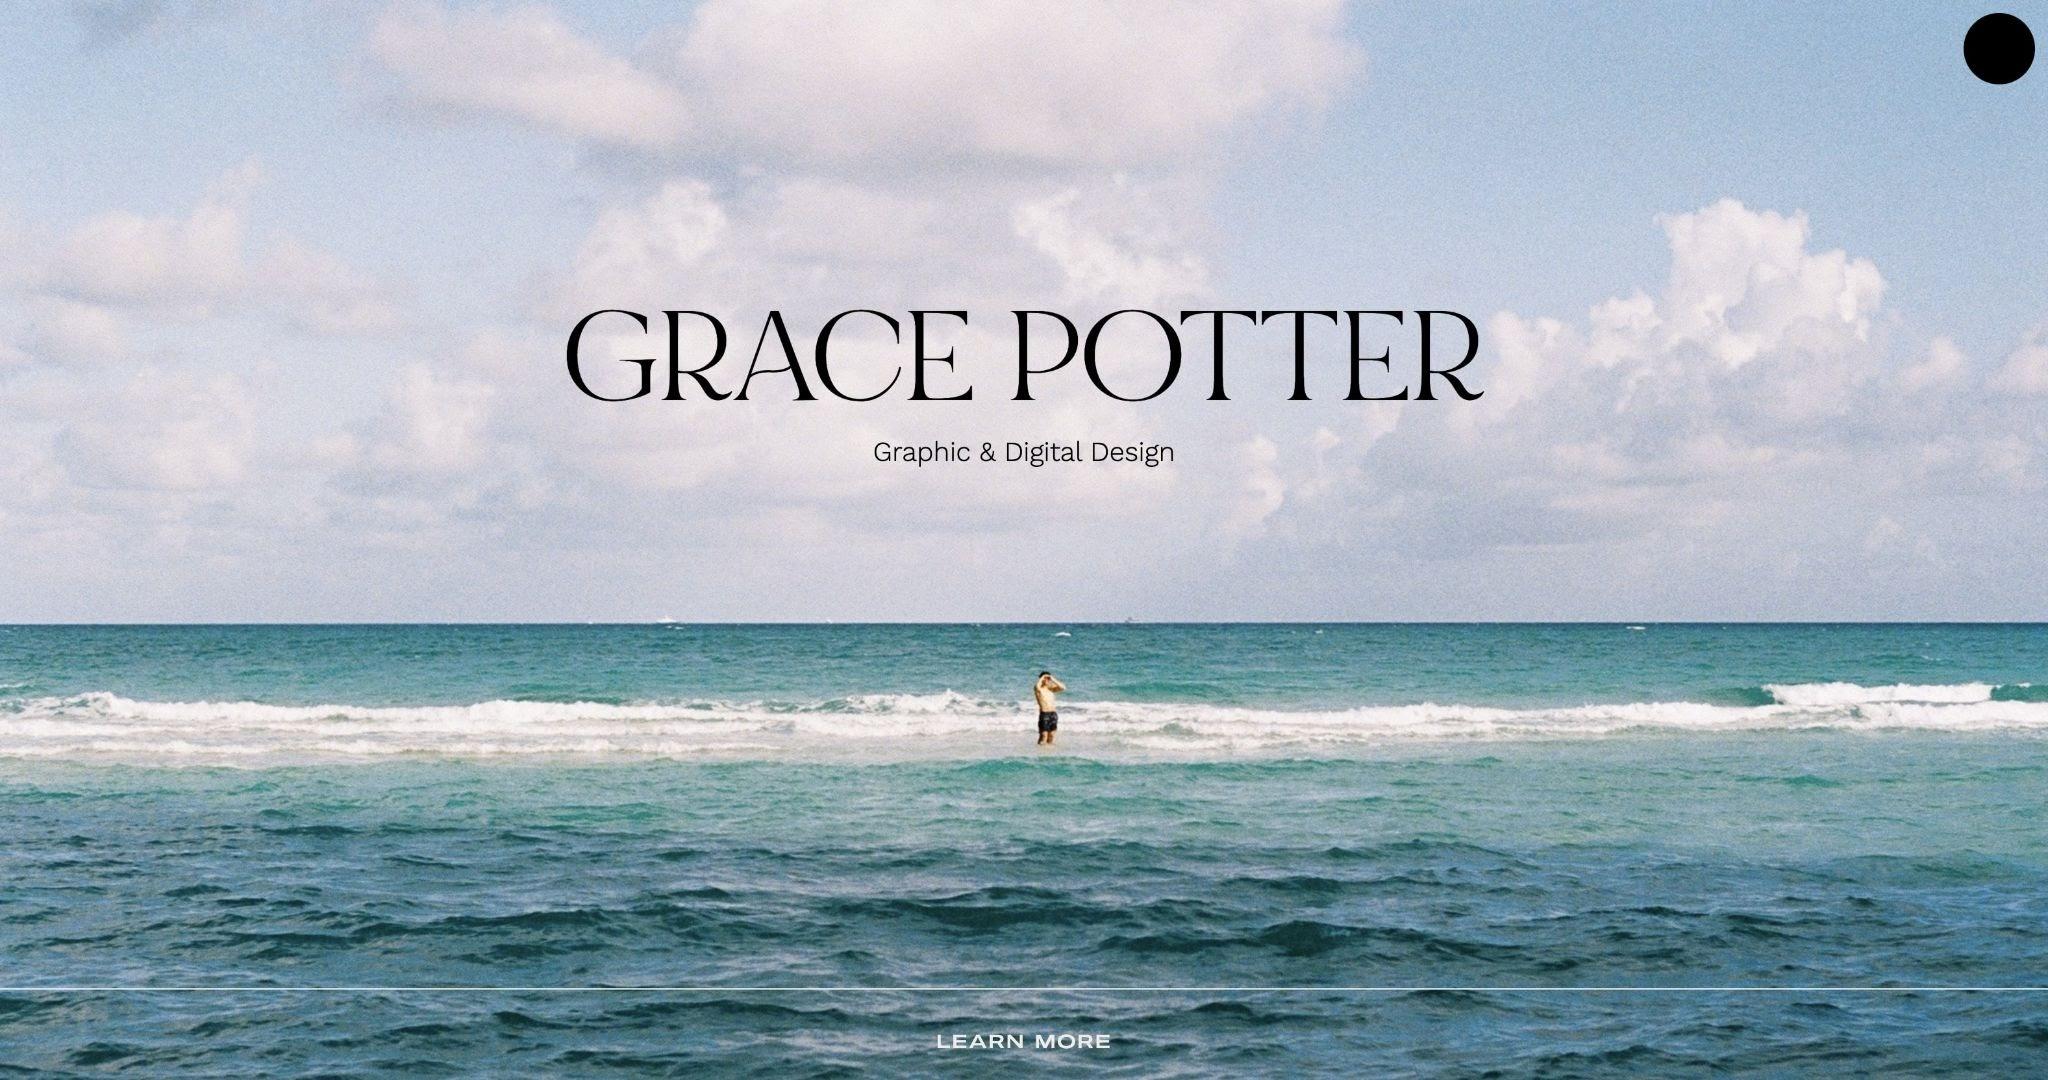 An image of Grace Potter's portfolio website.